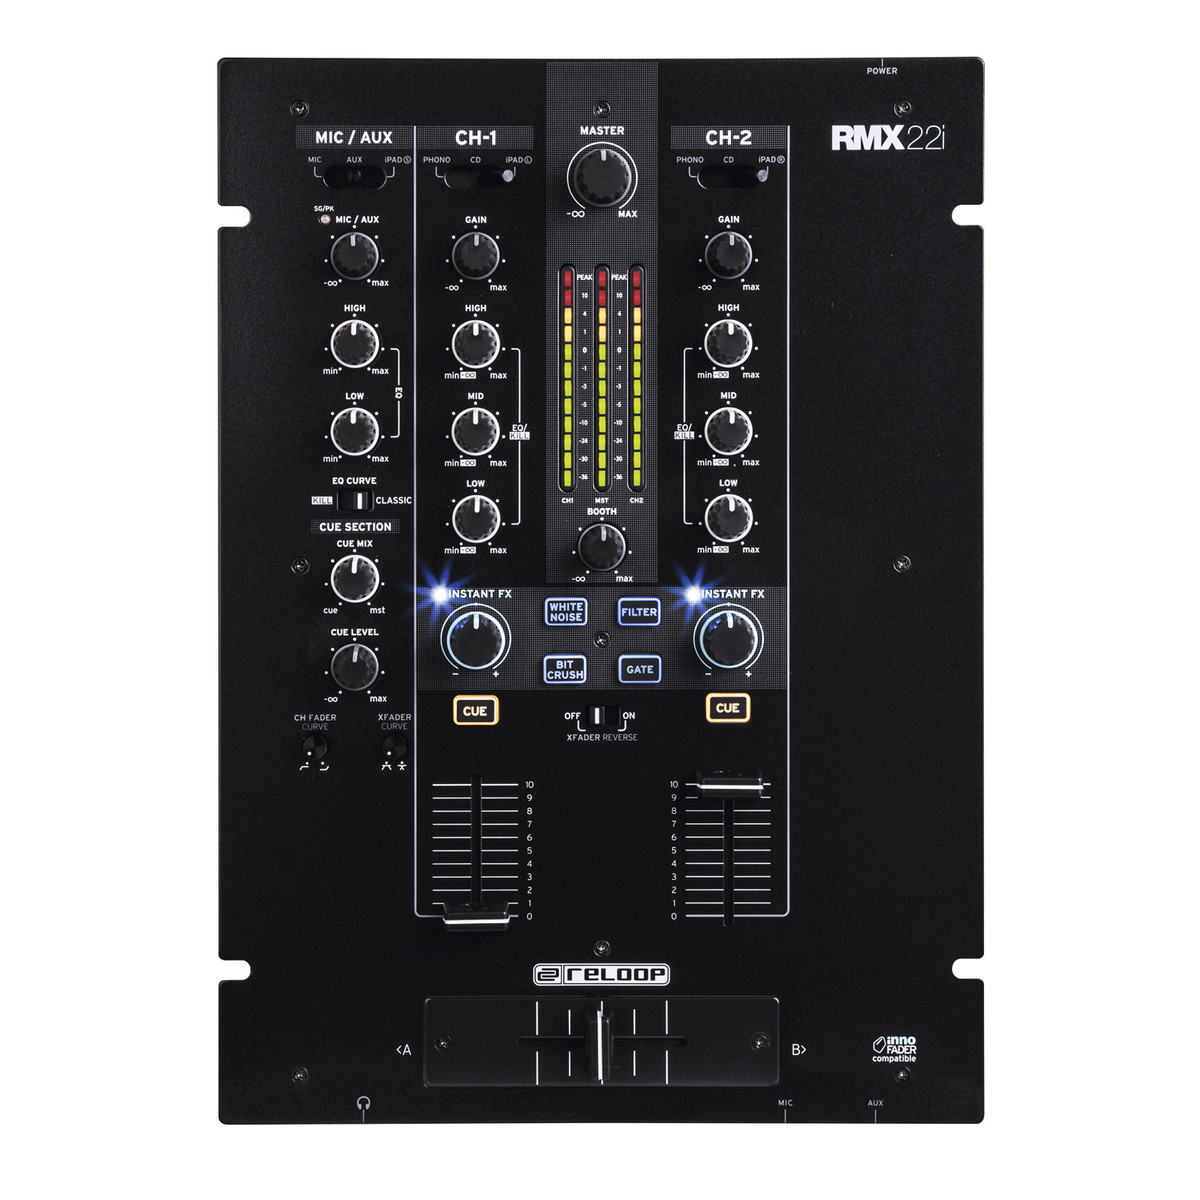 Reloop RMX-22i 2 Channel DJ Mixer - Box Opened